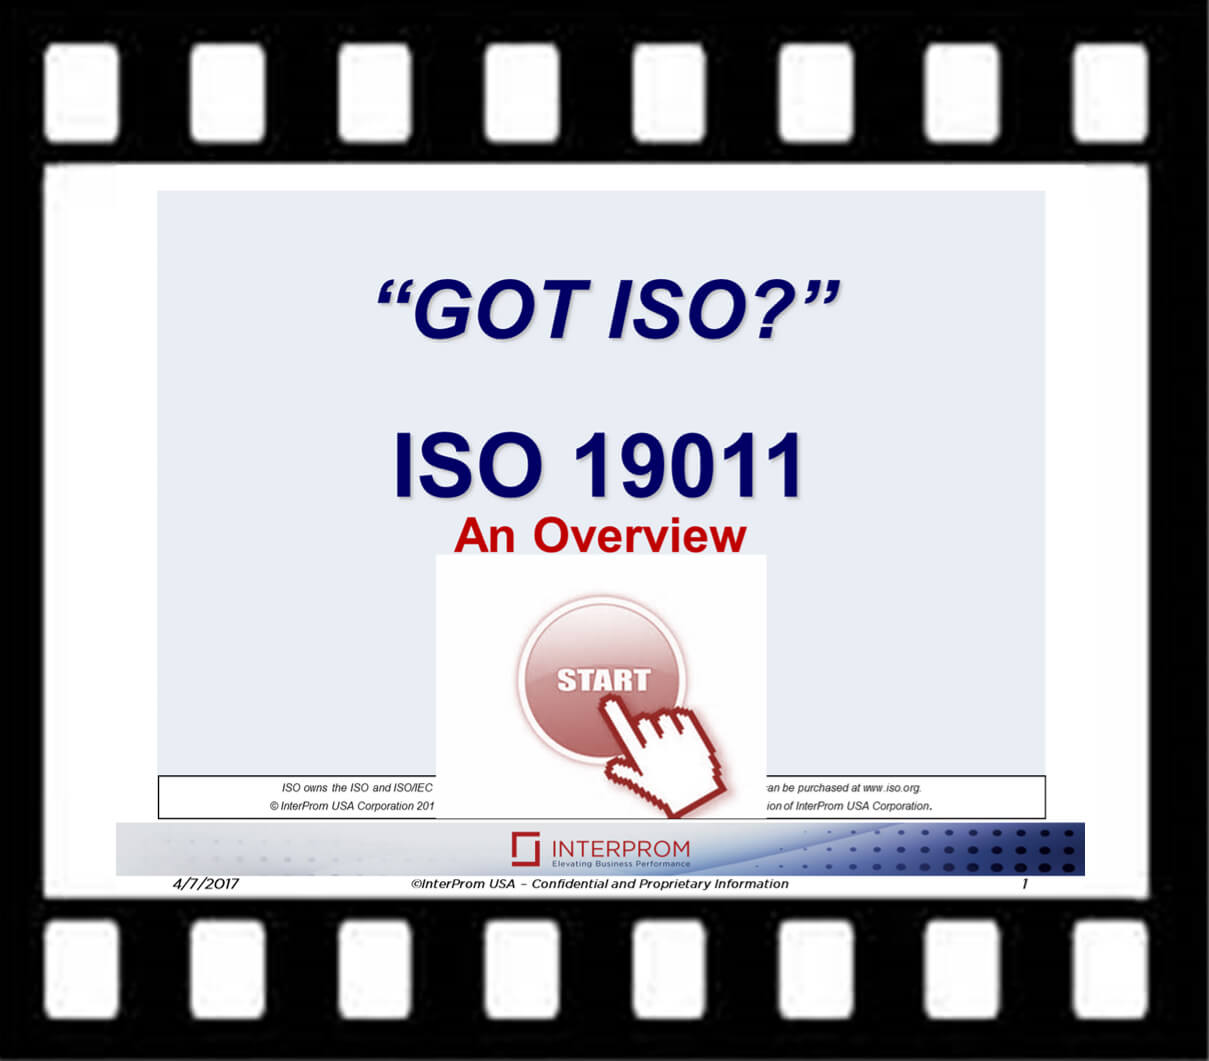 GOT ISO 19011 Overview Webinar Recording